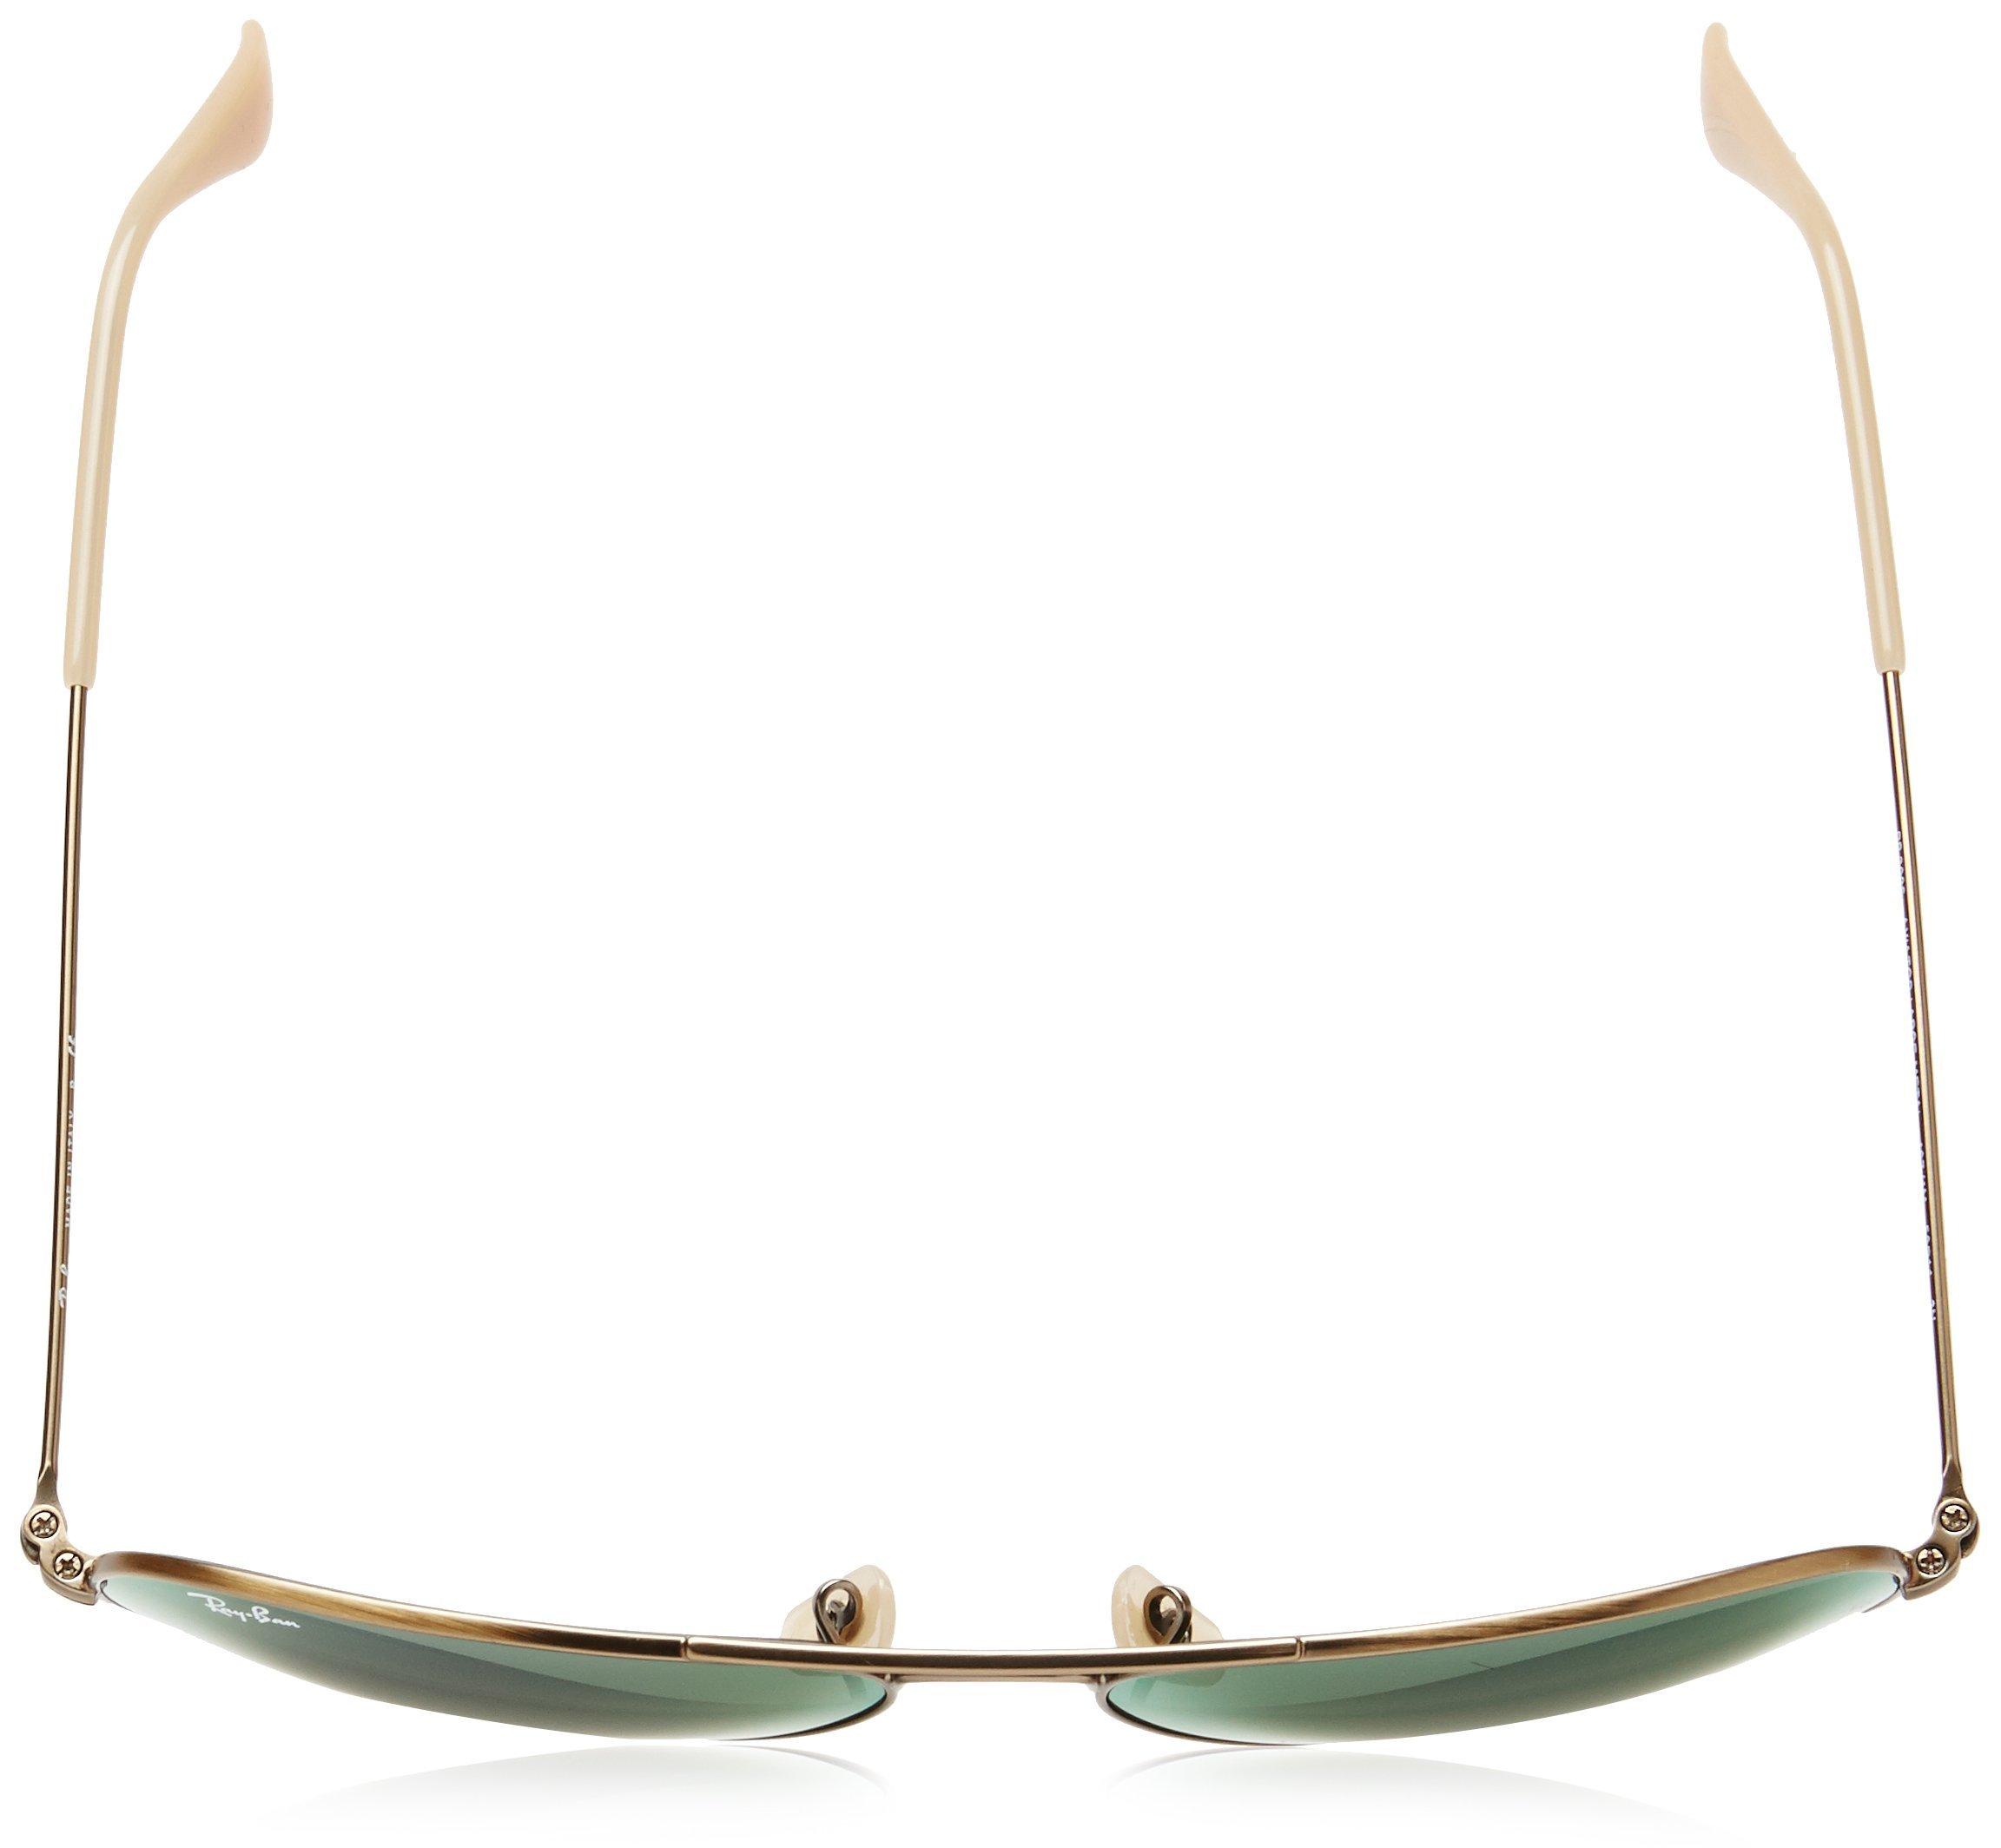 Ray-Ban 3025 Aviator Large Metal Mirrored Non-Polarized Sunglasses, Bronze-Copper/Violet Mirror (167/1M), 58mm